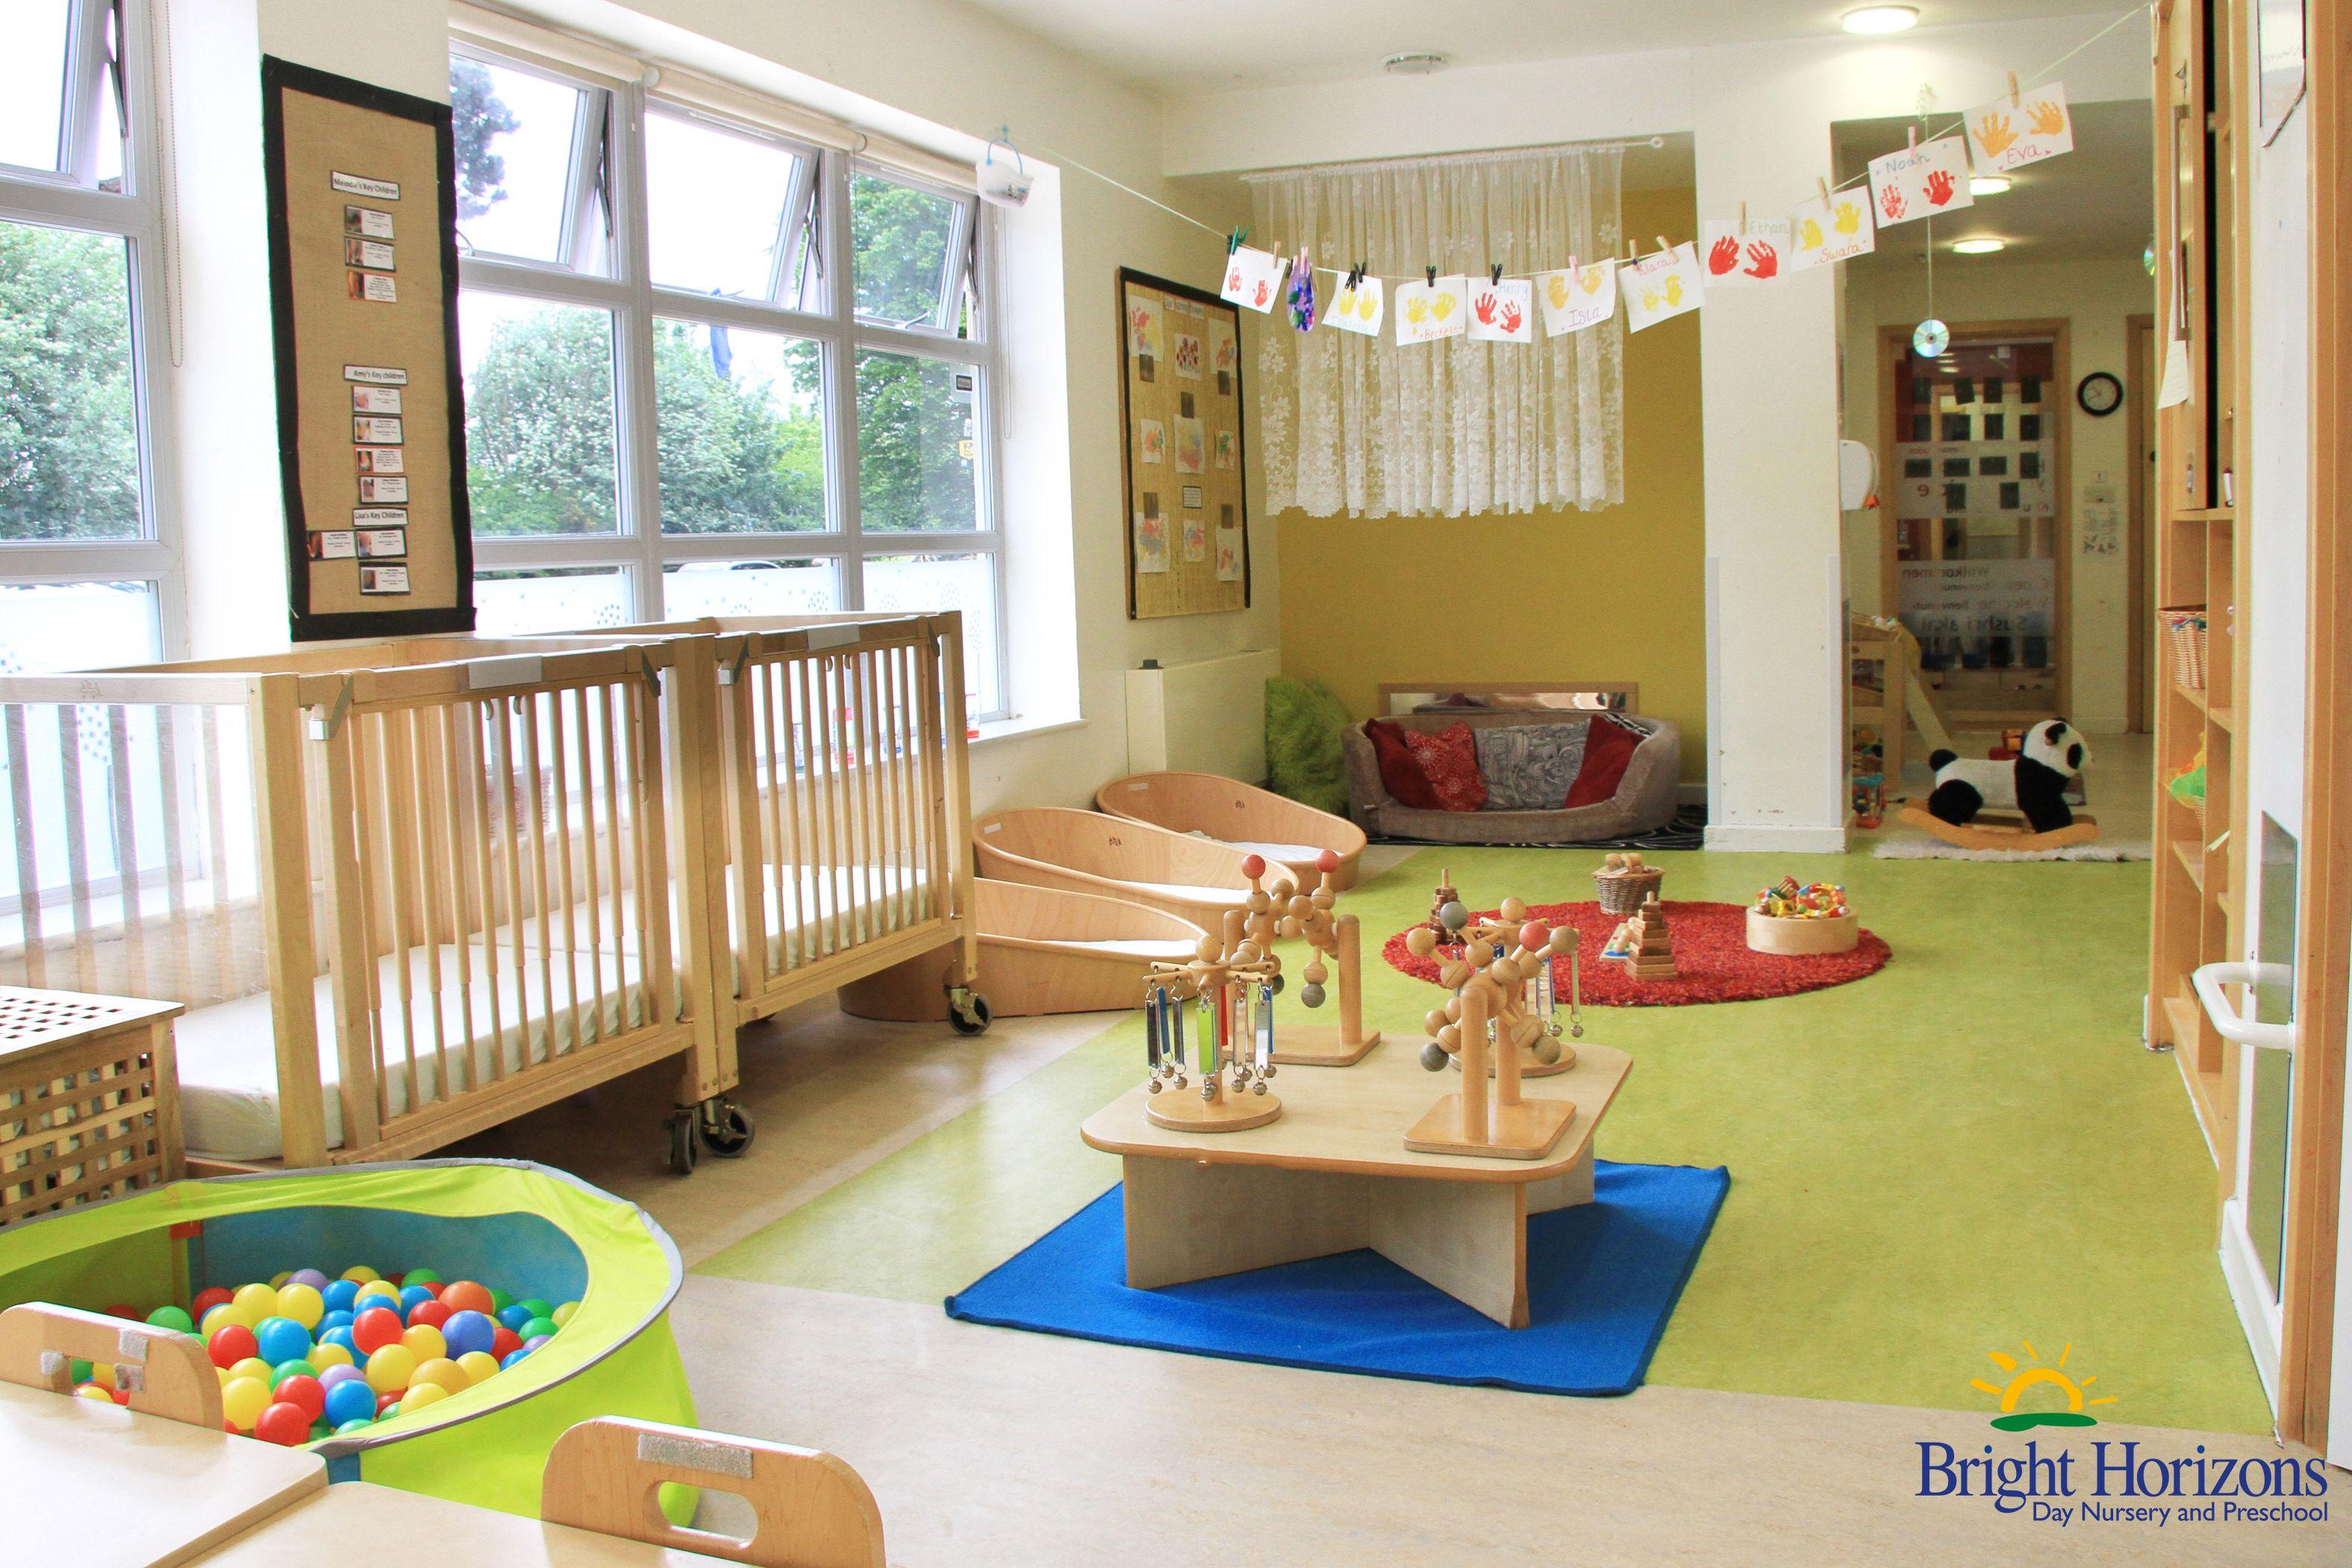 Bickley Nursery And Preschool Is A Modern Purpose Built Nursery Benefitting From Light And Airy Rooms Ena Nursery Nursery Preschool Bright Horizons Nursery